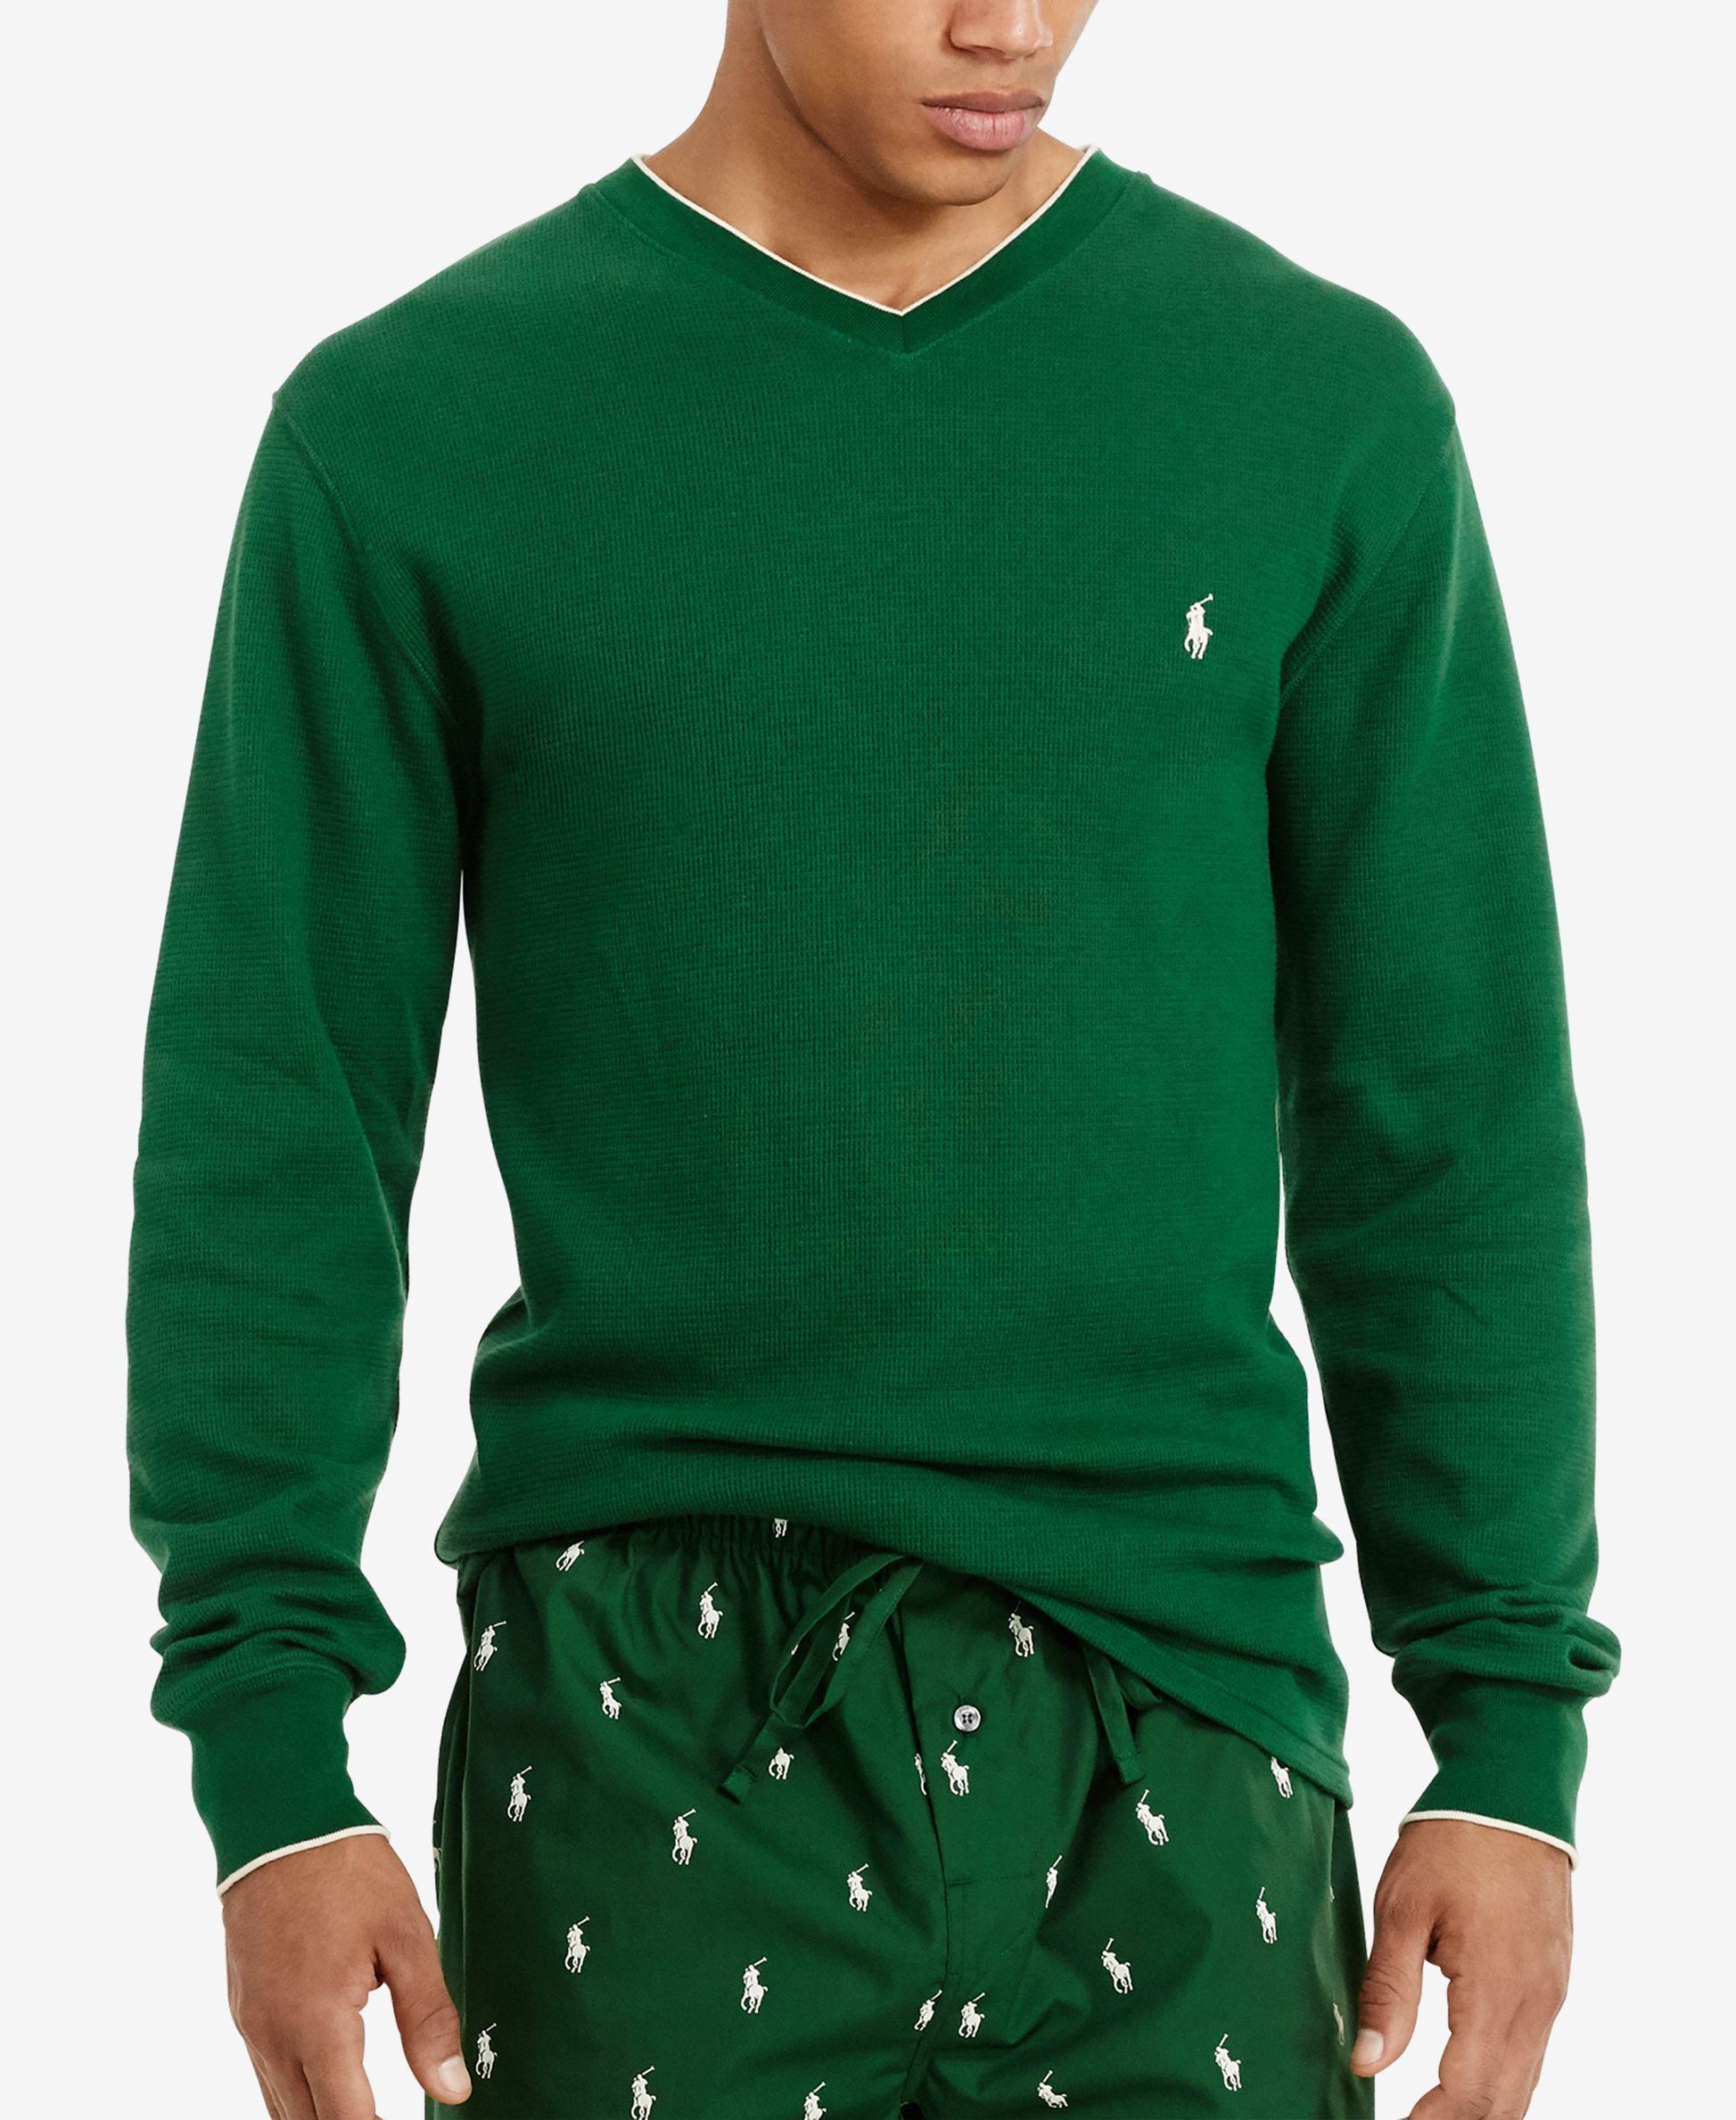 Polo Ralph Lauren Mens Tipped Thermal V Neck Shirt Kerrie